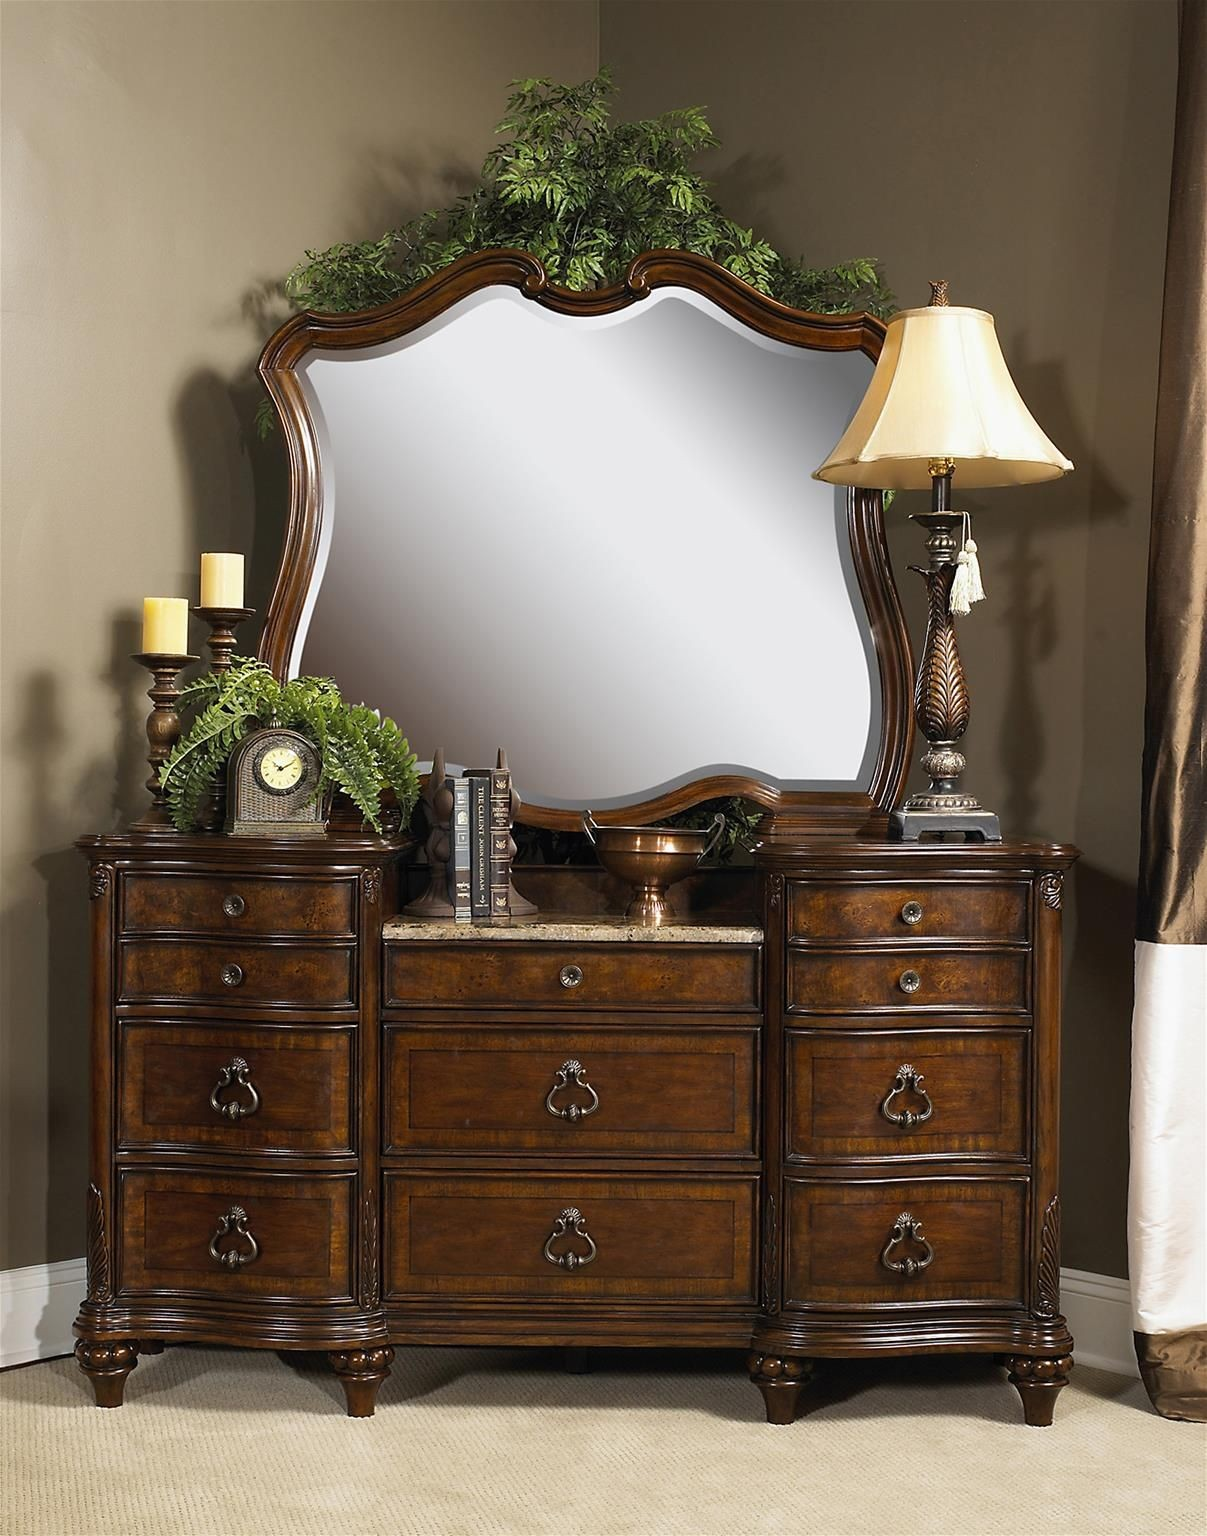 Marisol Brighton Cherry Panel Bedroom Set From Fairmont Designs S7057 Q Coleman Furniture